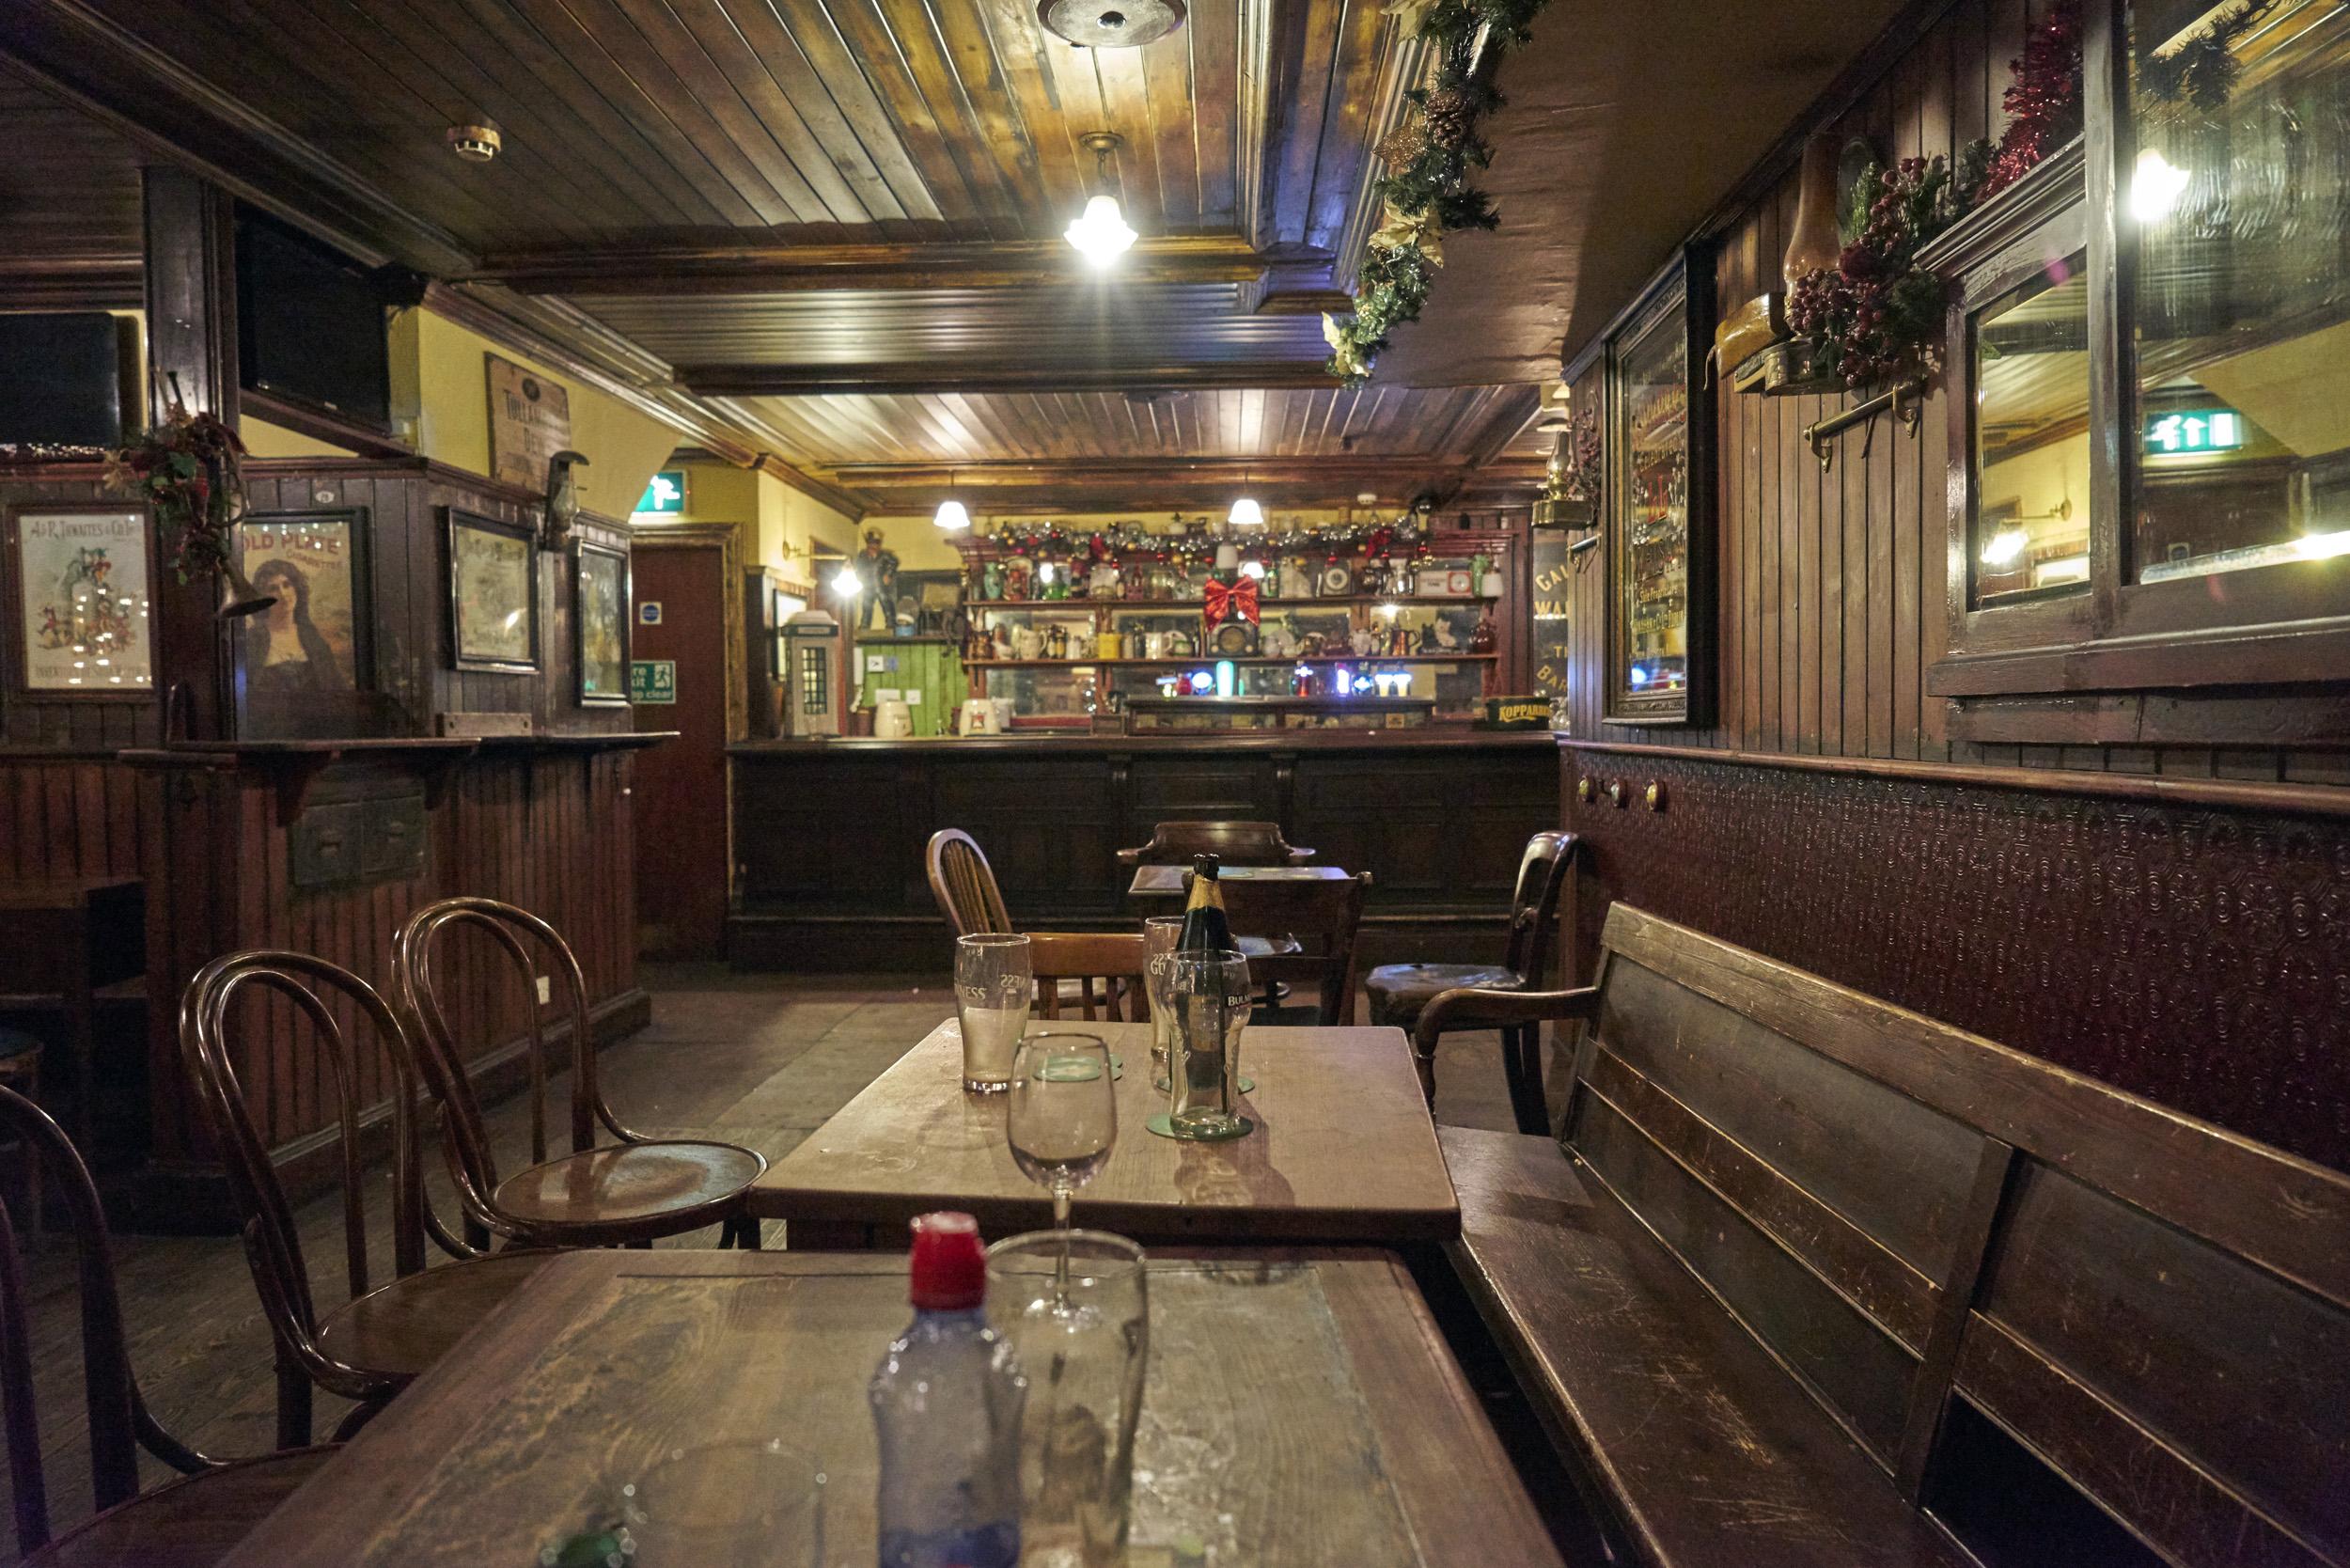 Empty Pub, very rare….but sad!